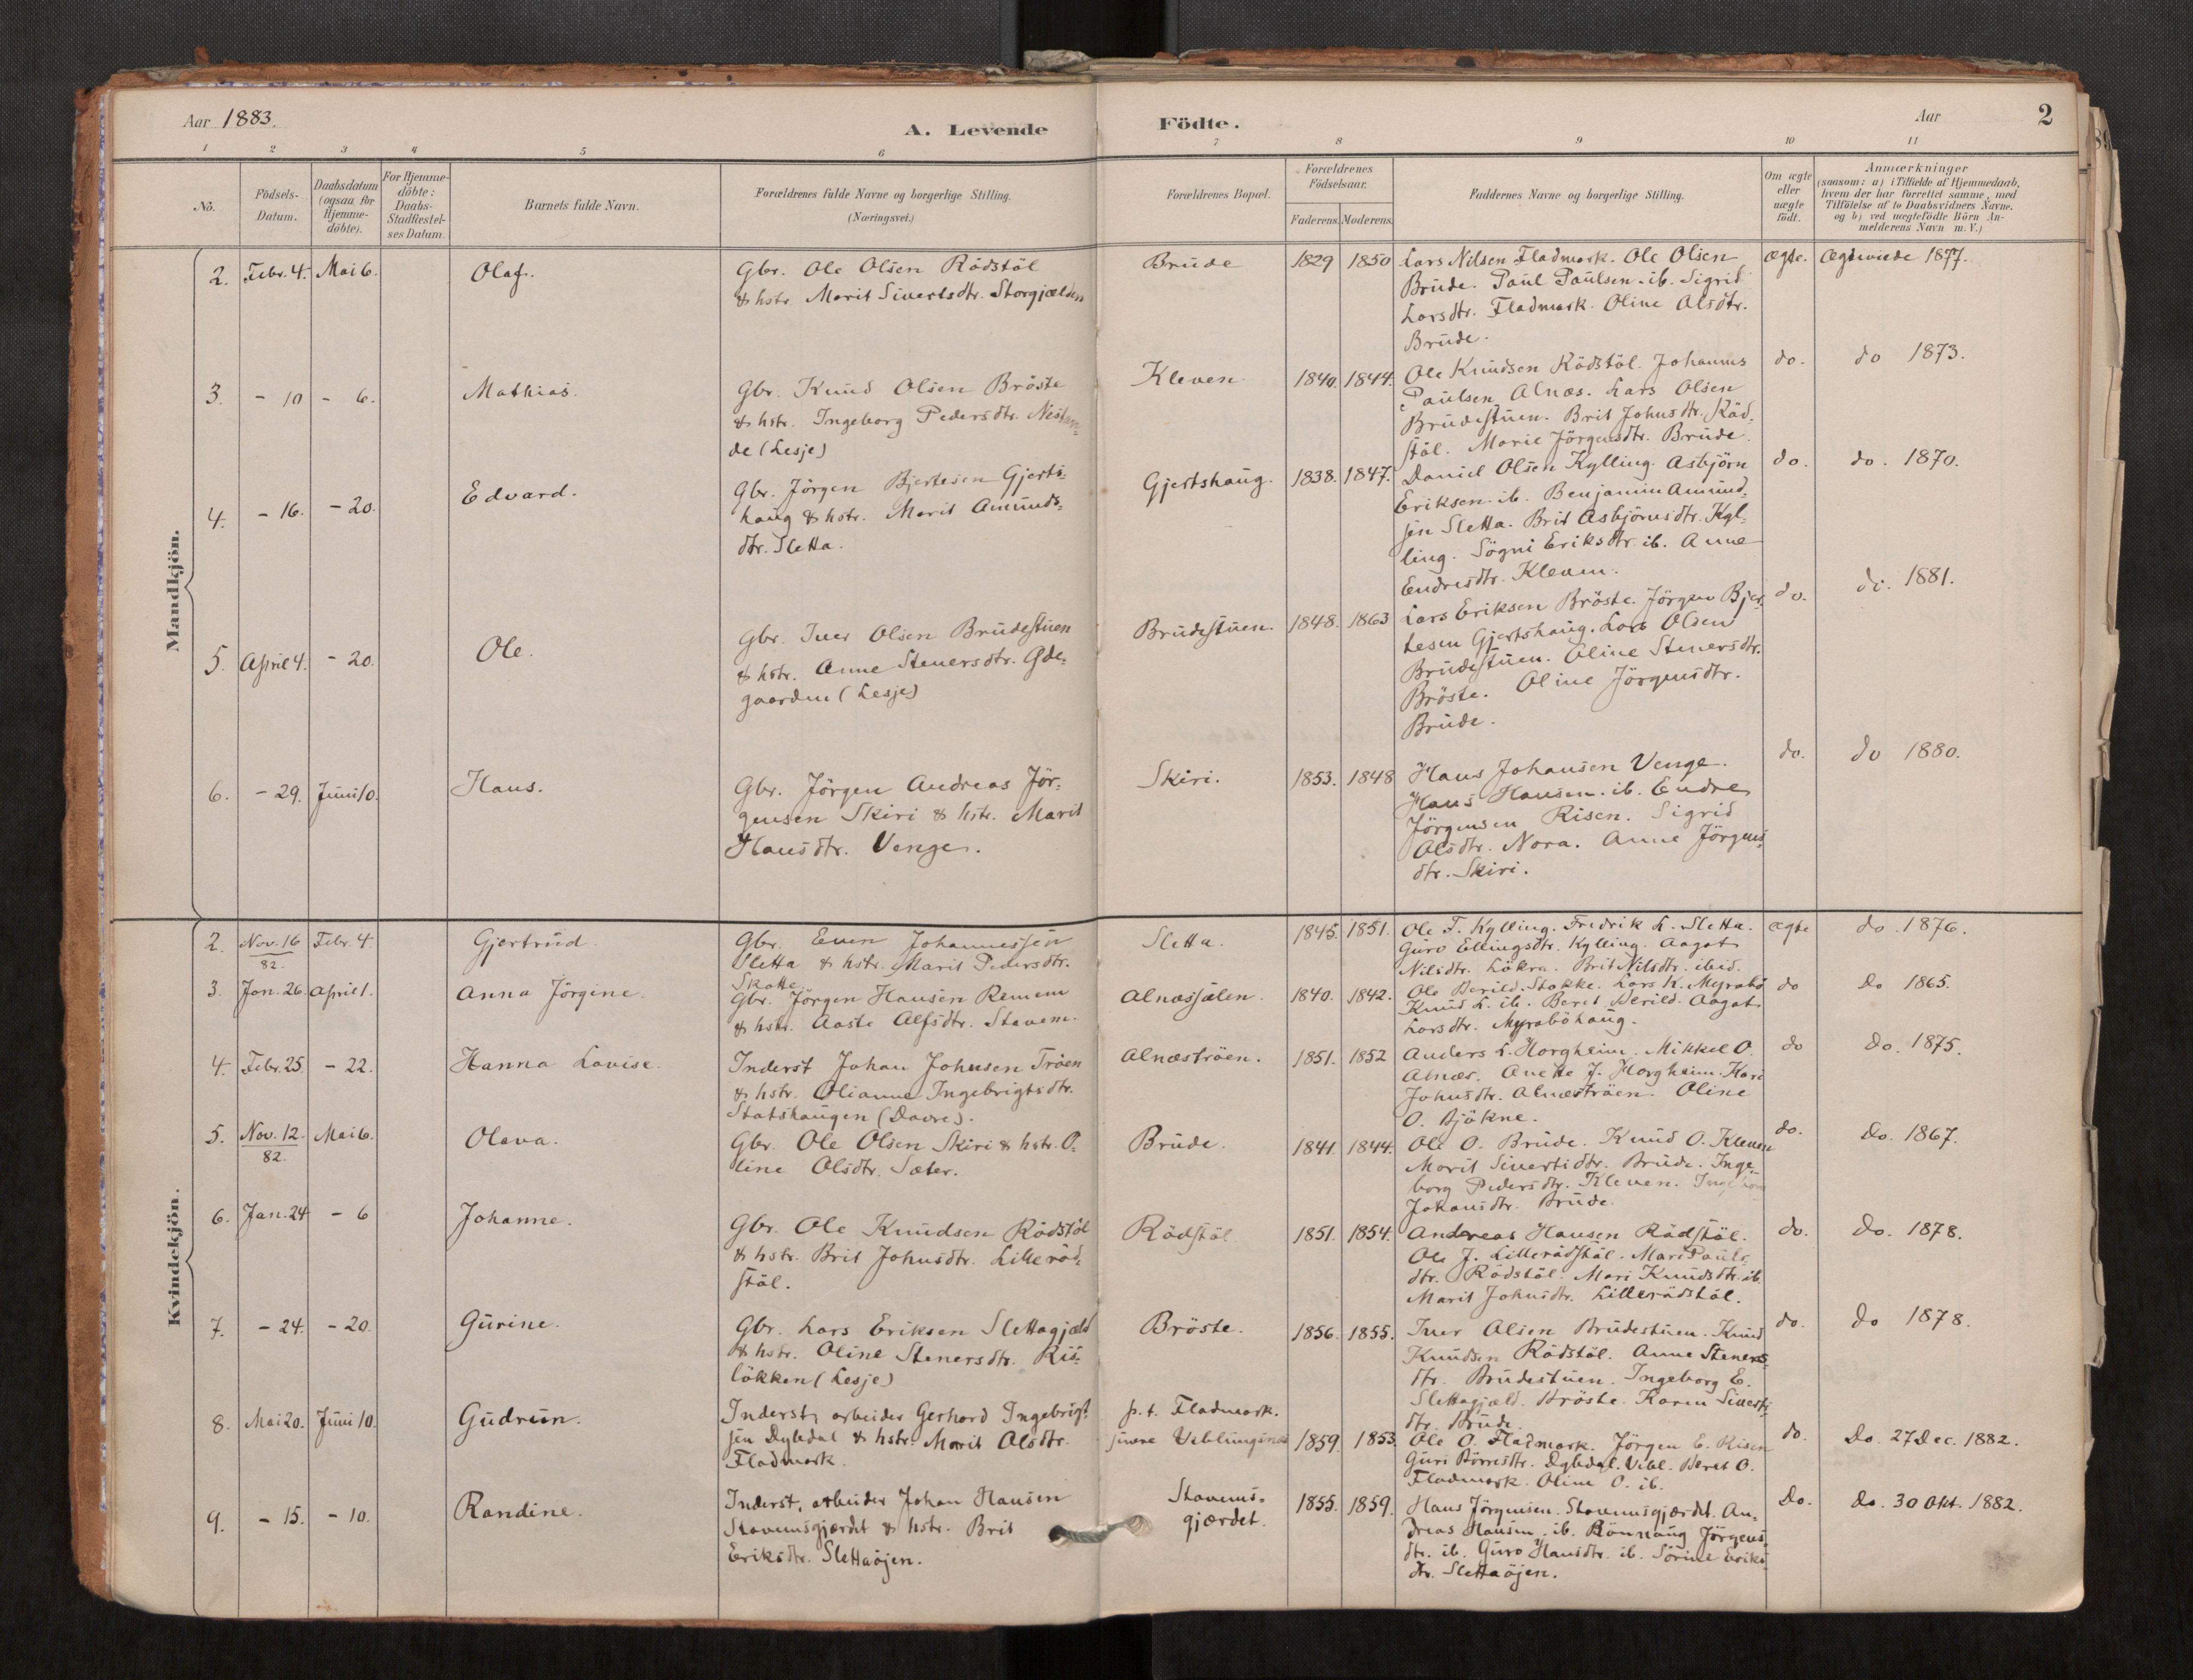 SAT, Grytten sokneprestkontor, Ministerialbok nr. 546A03, 1882-1920, s. 2